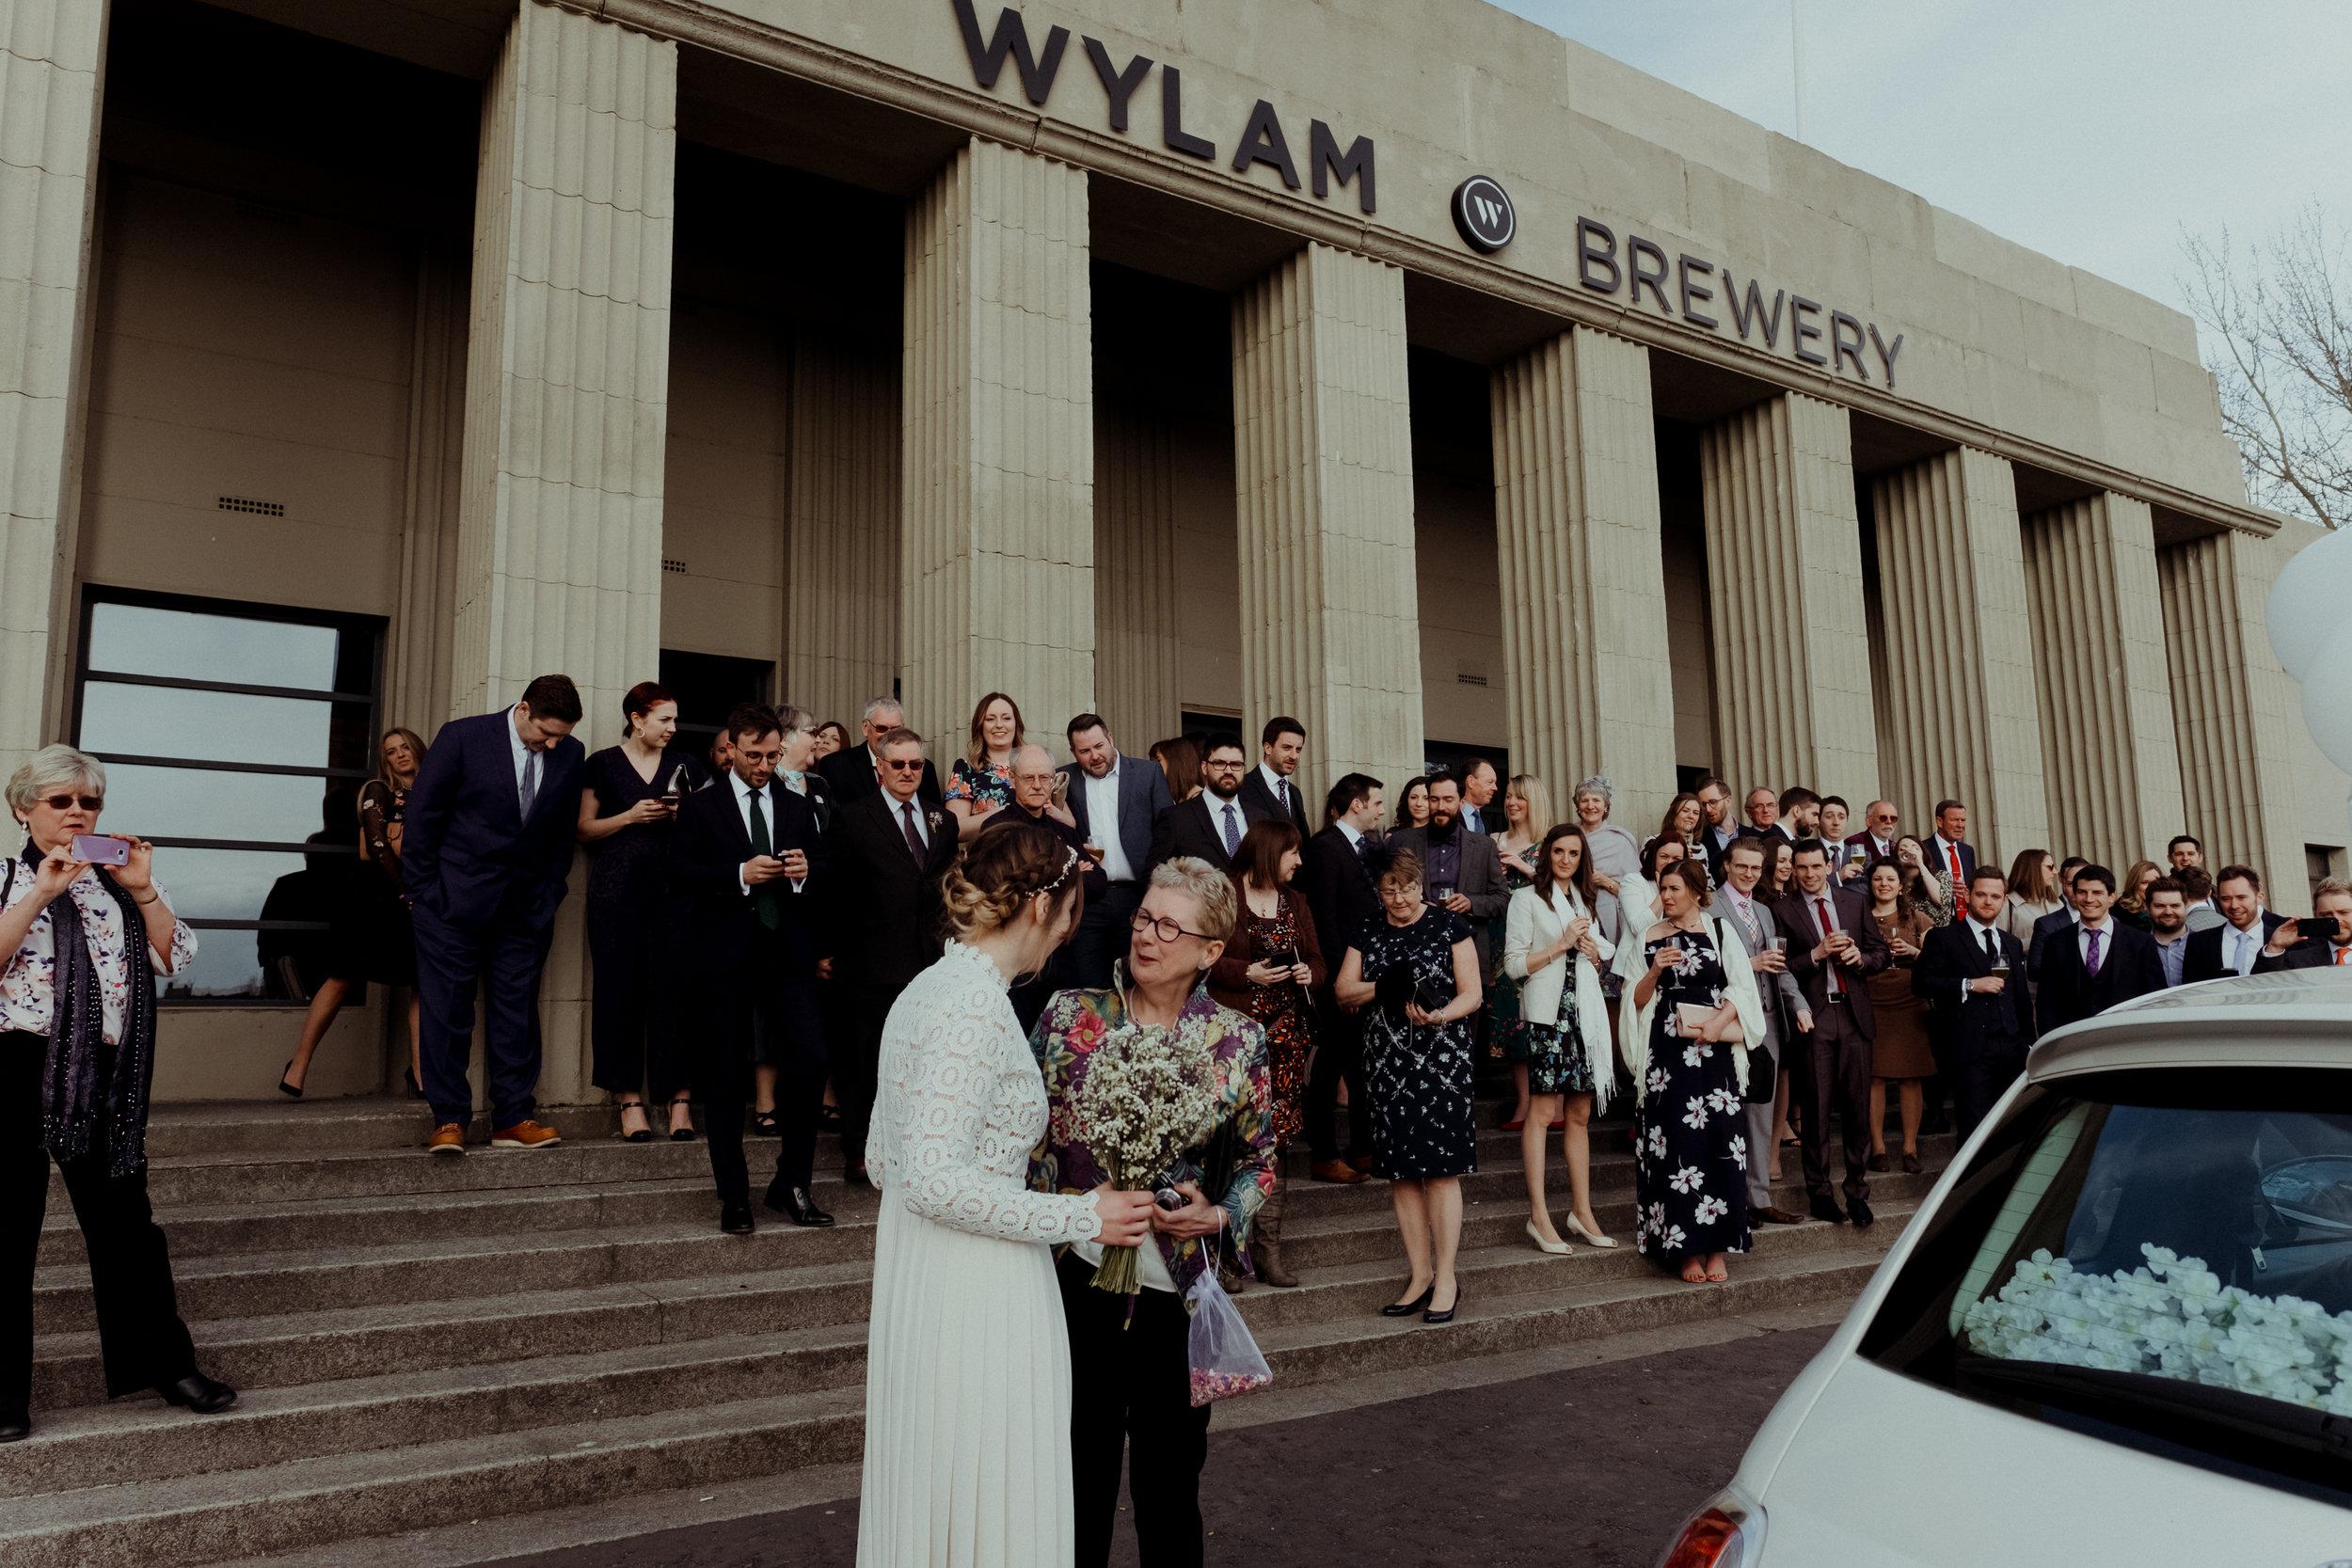 WYLAM-BREWERY-WEDDING-PHOTOGRAPHER-87.jpg